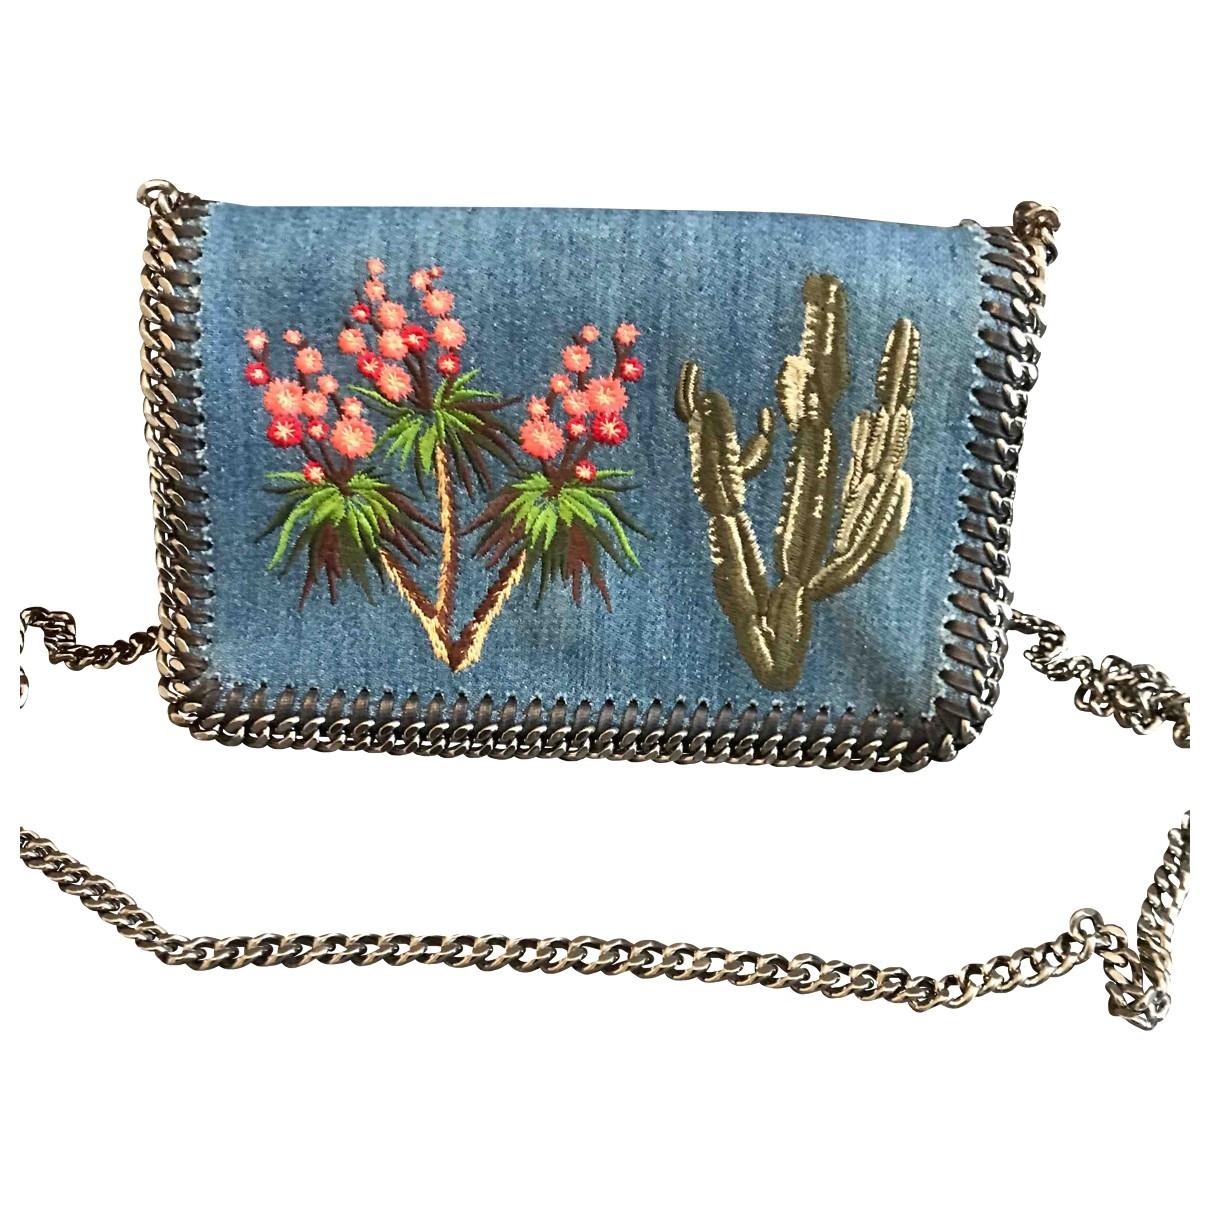 Stella Mccartney Falabella Blue Denim - Jeans handbag for Women \N